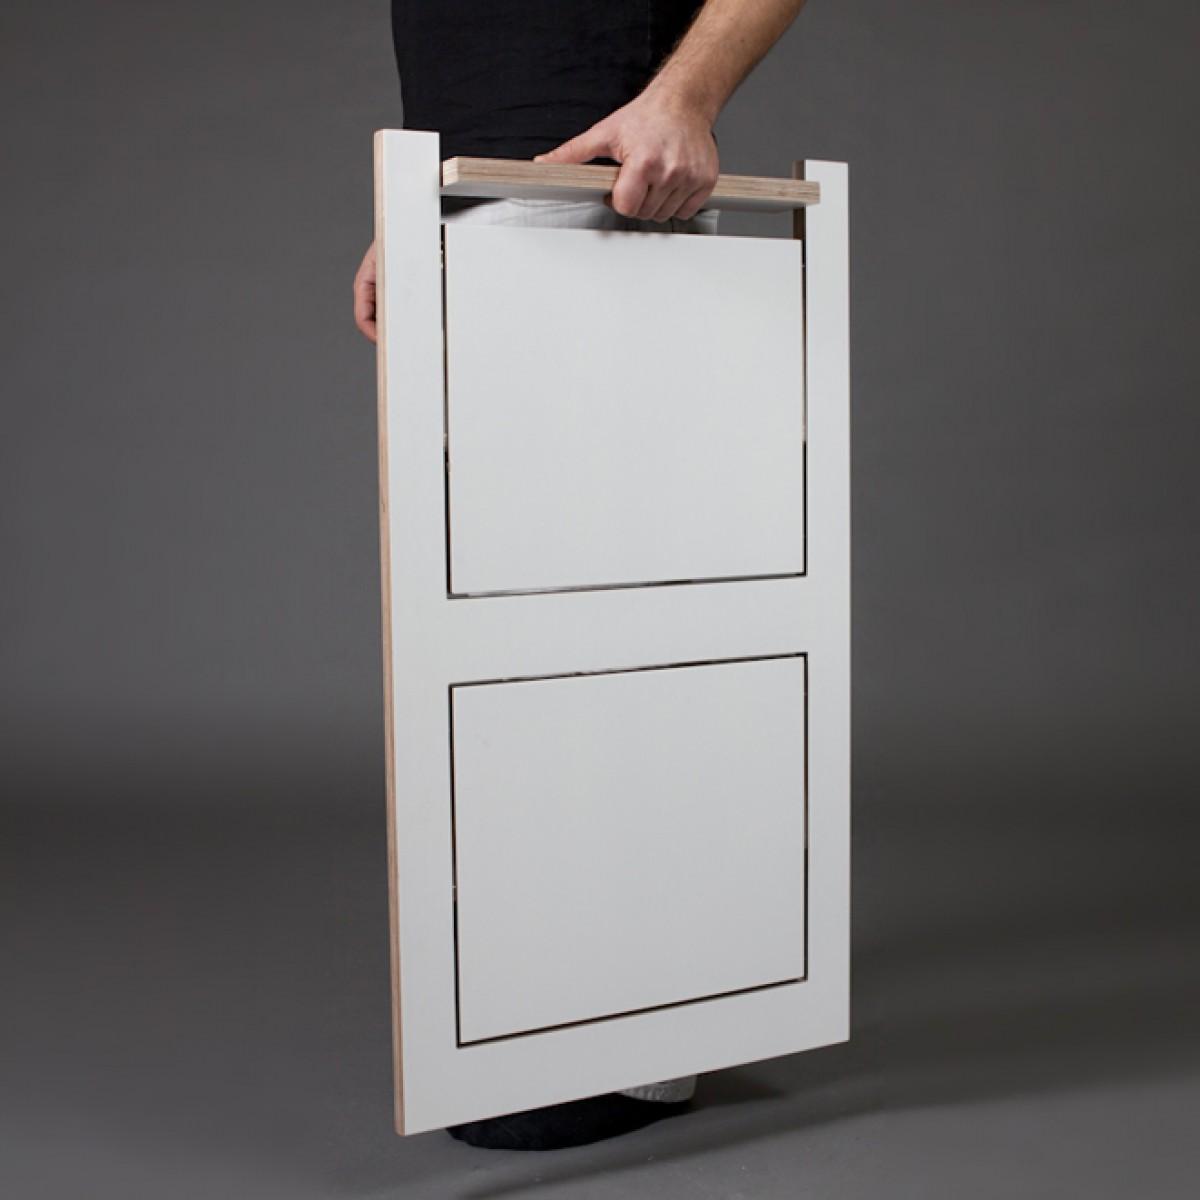 ambivalenz klappstuhl fl pps wei wei. Black Bedroom Furniture Sets. Home Design Ideas